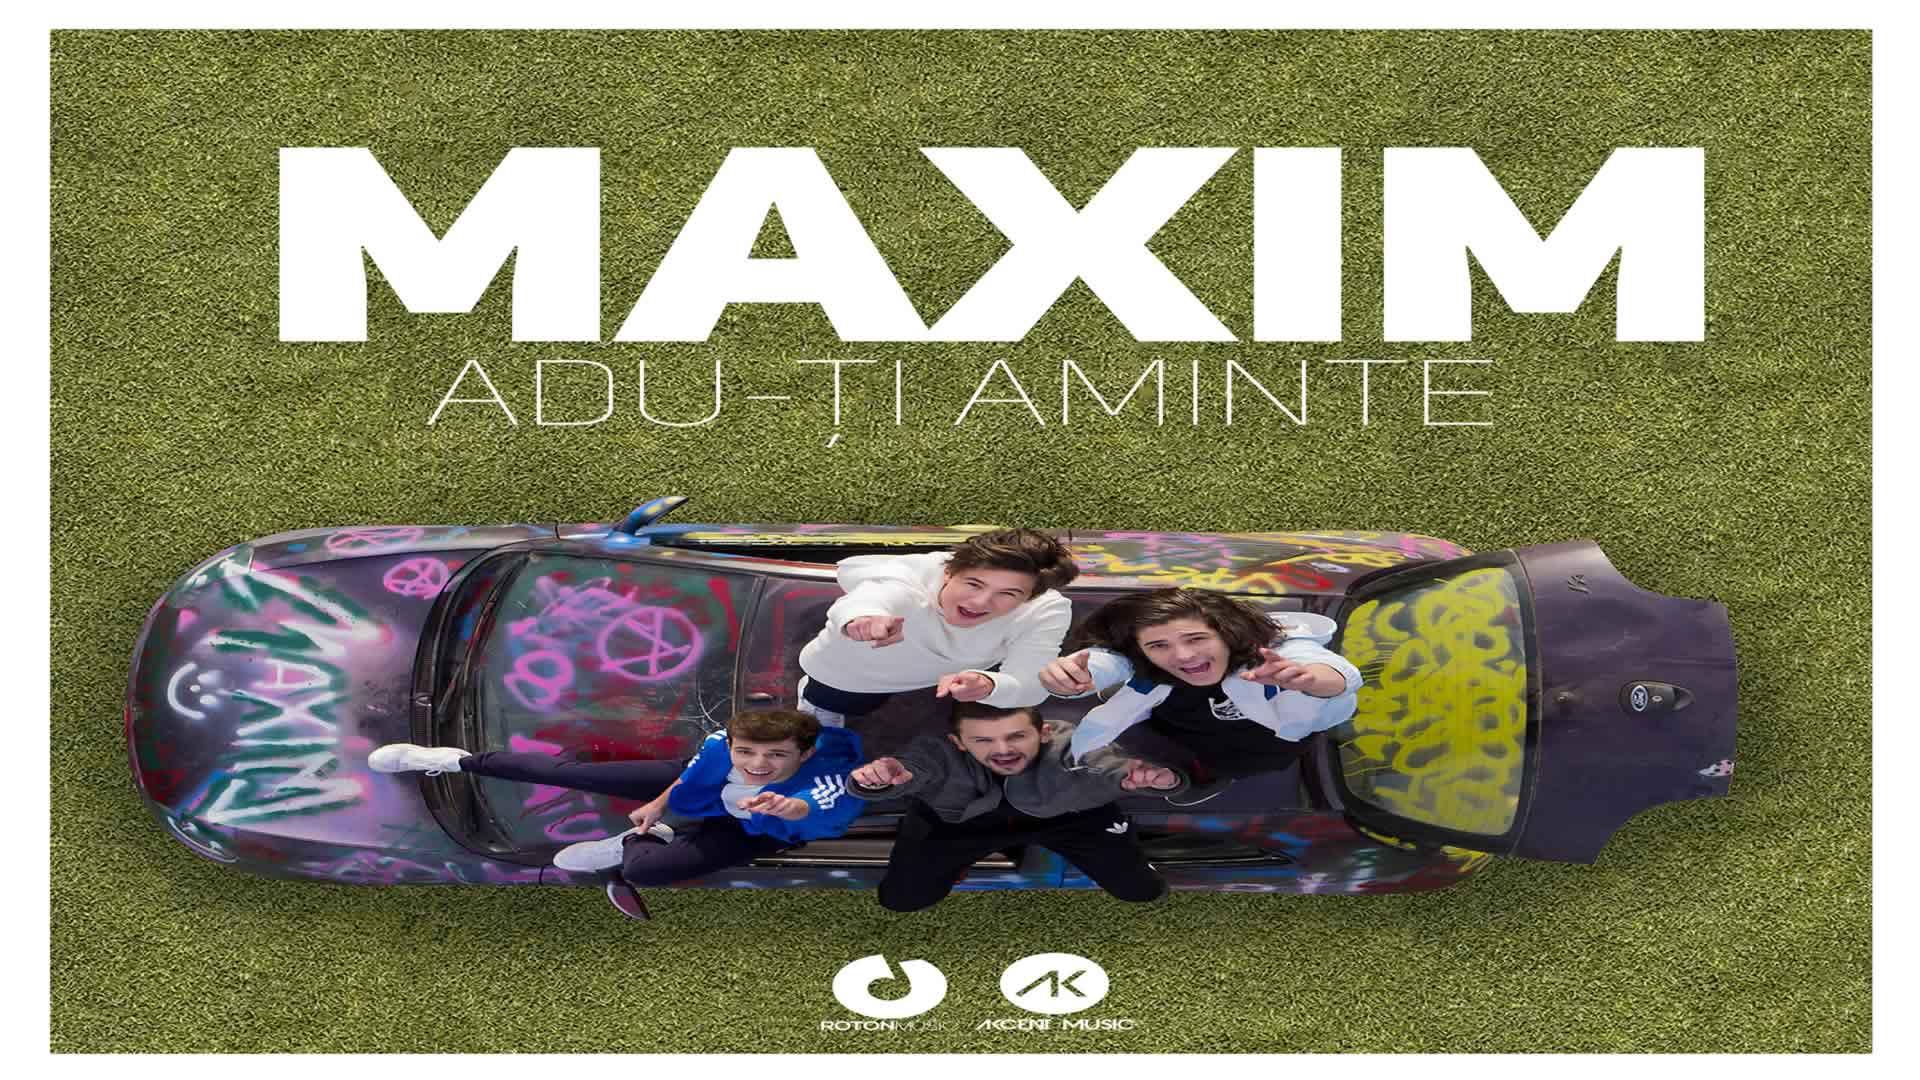 Maxim - Adu-ti aminte